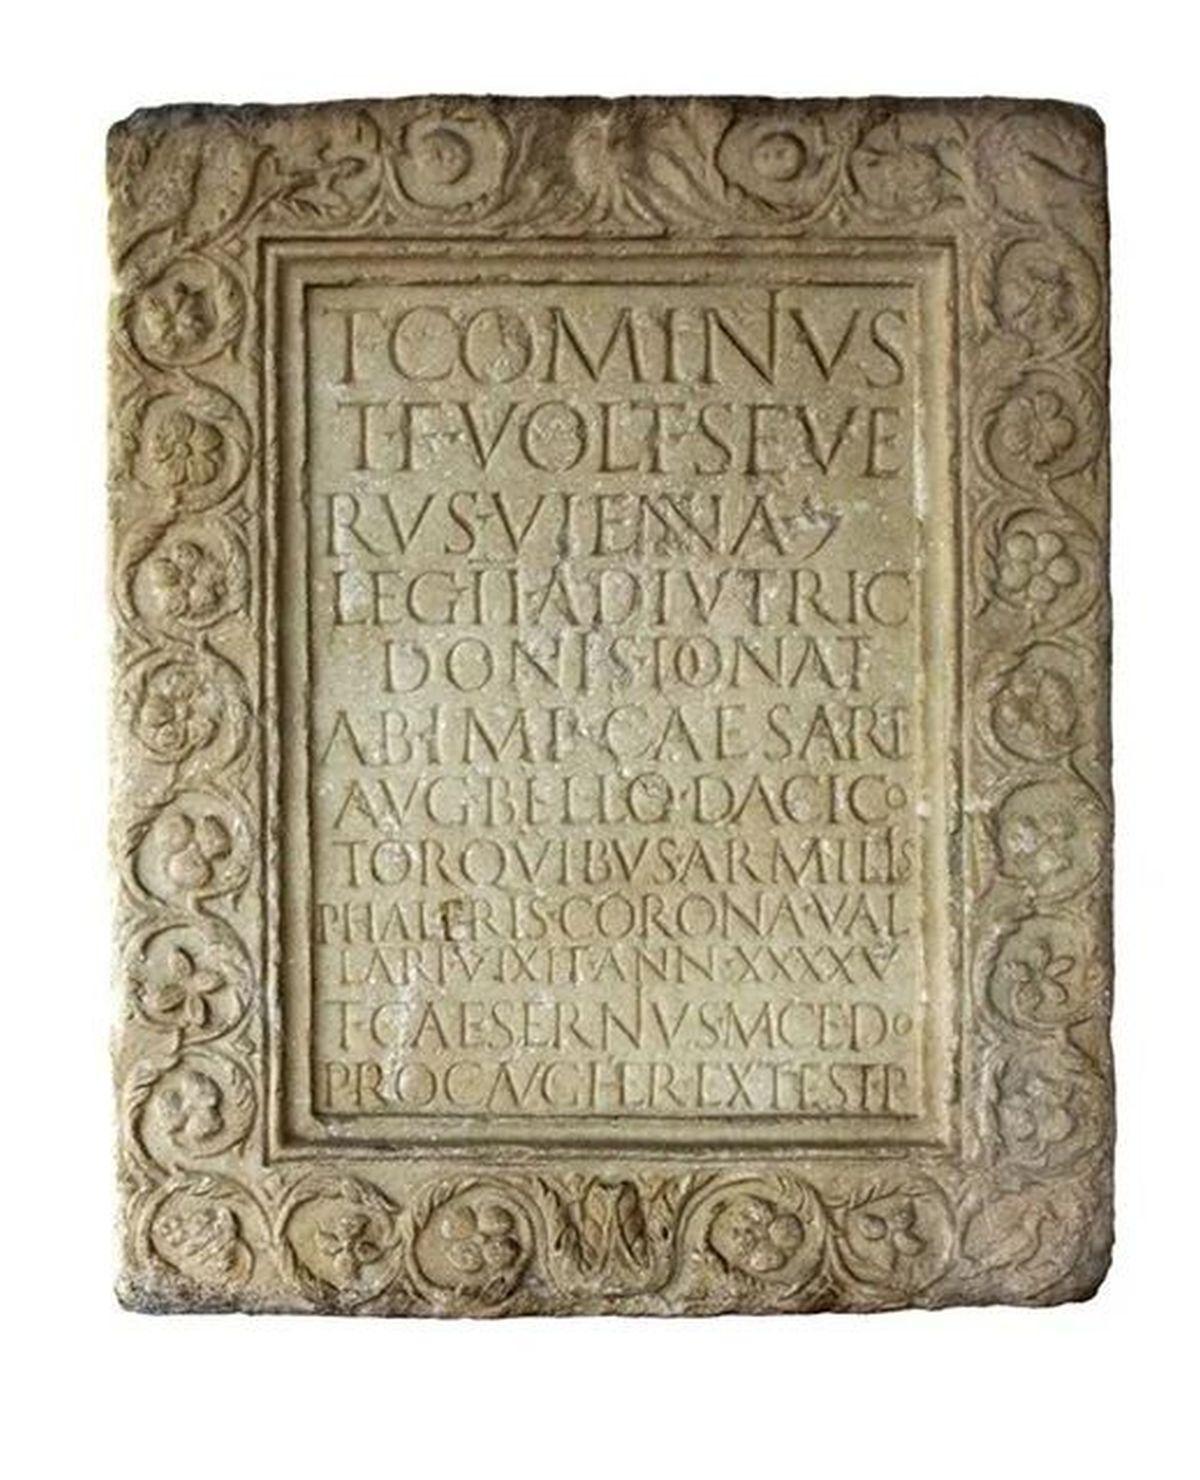 Nagrobek centuriona Tytusa Kominiusza Sewera